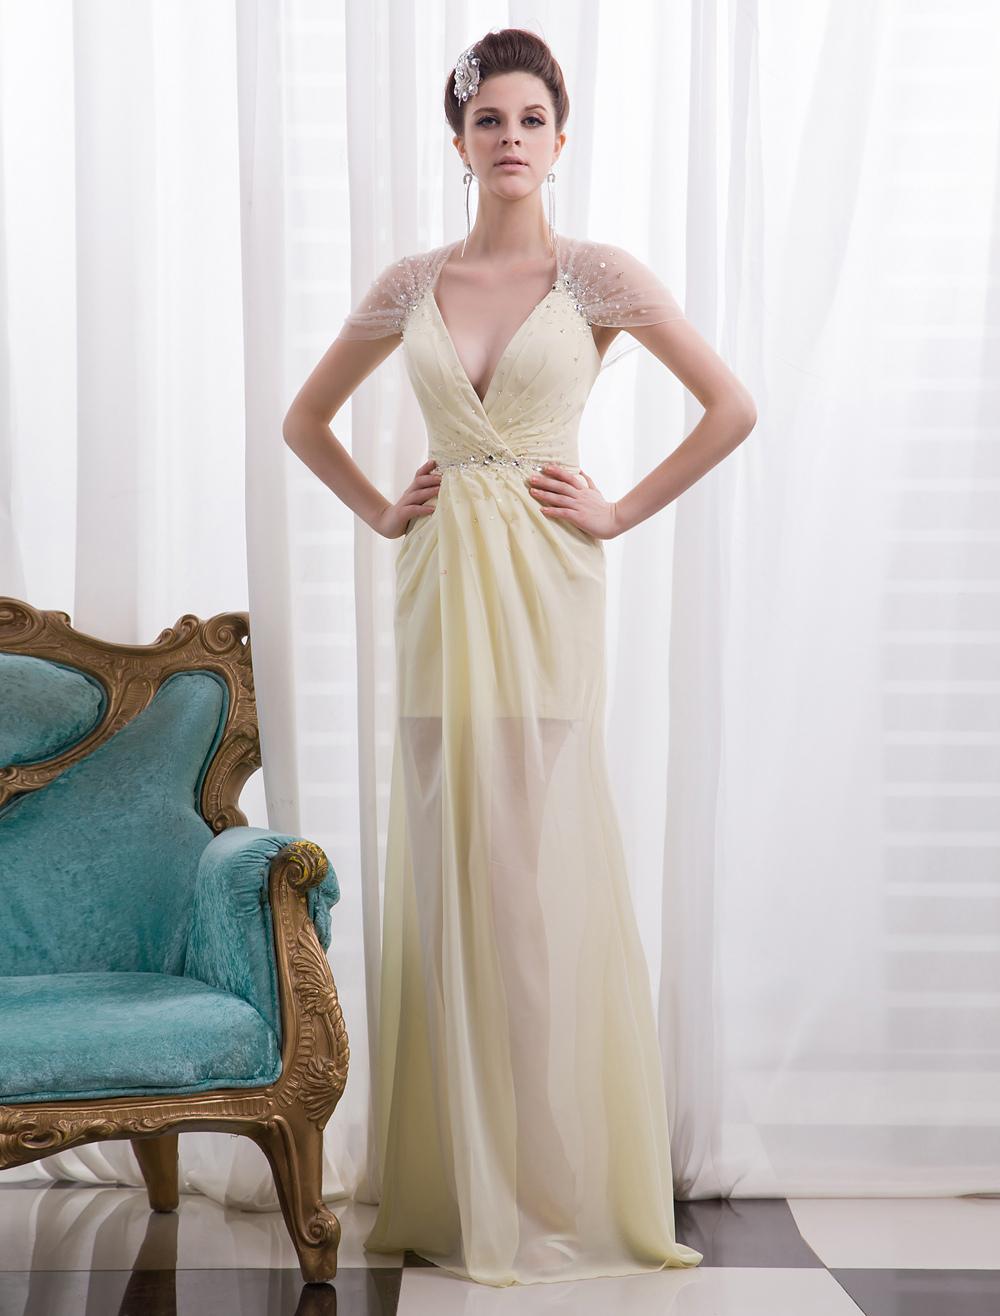 Daffodil Pleated Deep Sheath Chiffon Evening Dress with V-Neck Short Sleeves Milanoo (Wedding Evening Dresses) photo